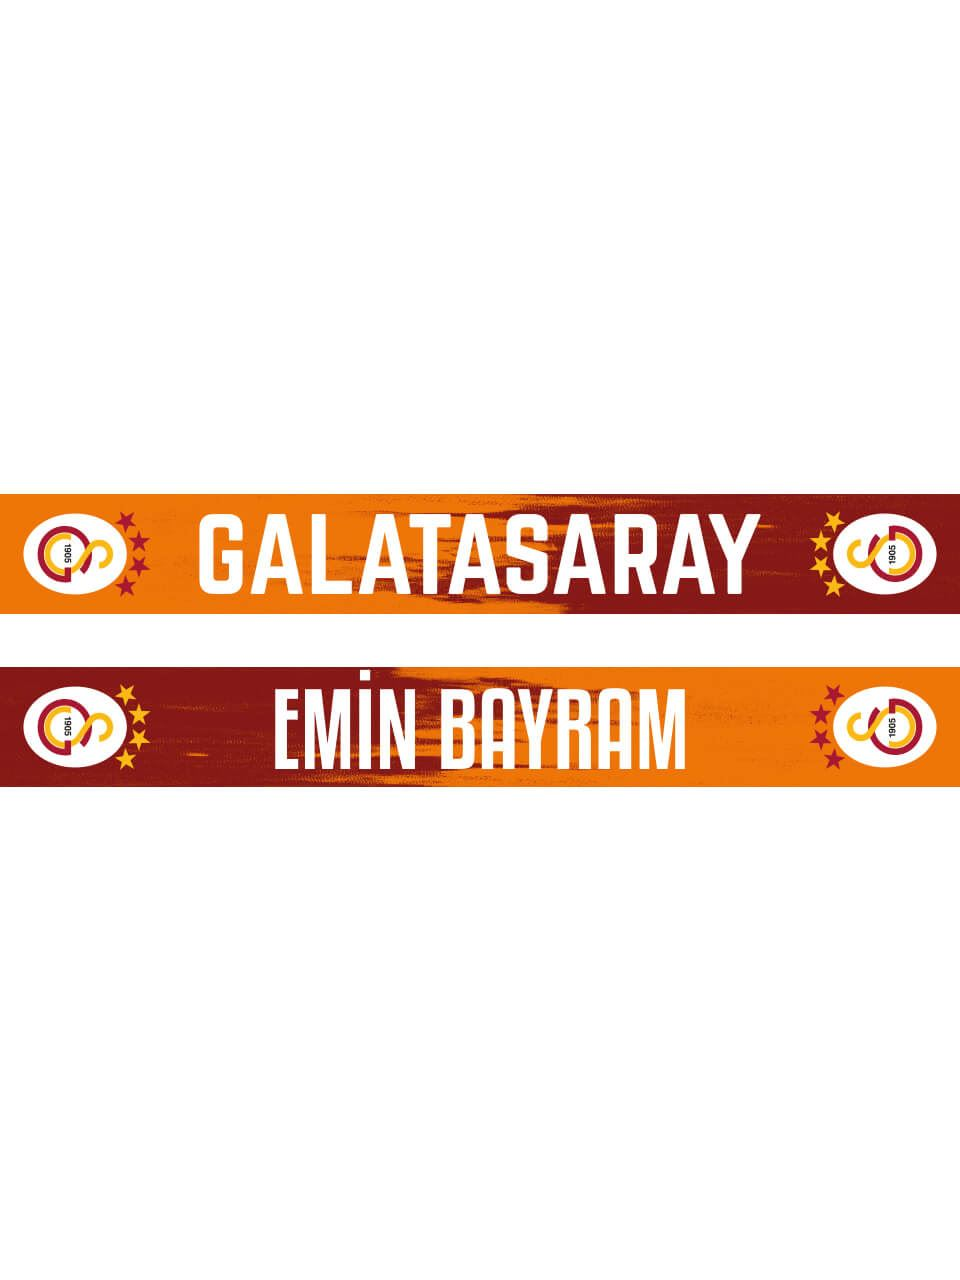 EMİN BAYRAM GALATASARAY ŞAL ATKI U999028